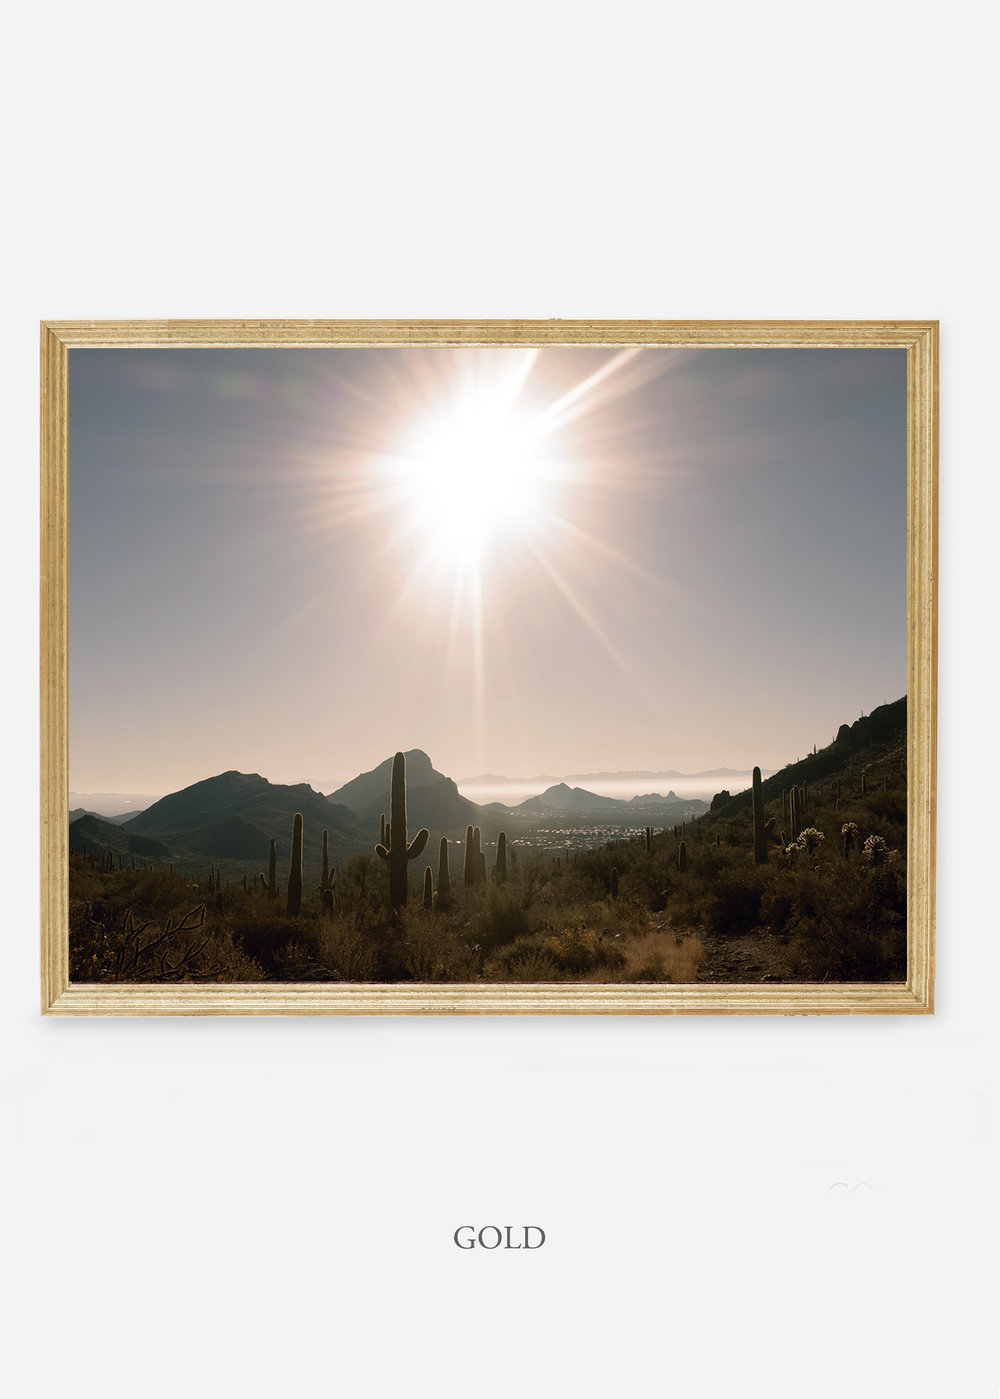 nomat-goldframe-saguaroNo.15-wildercalifornia-art-wallart-cactusprint-homedecor-prints-arizona-botanical-artwork-interiordesign.jpg